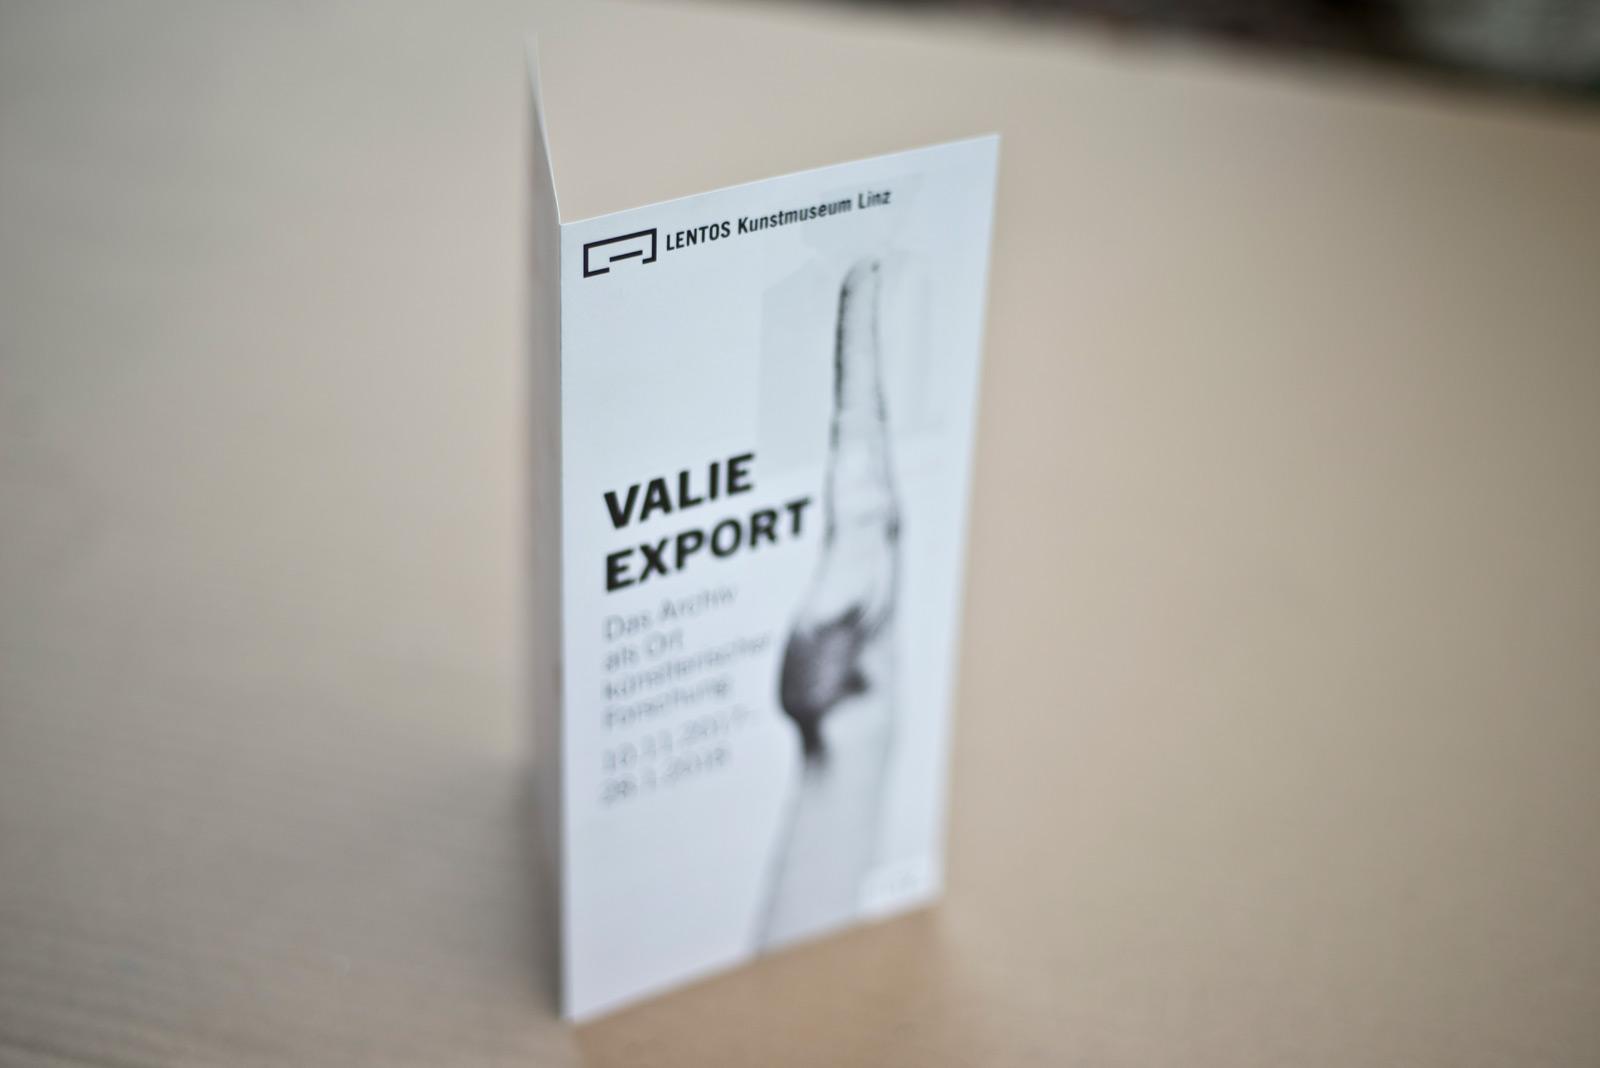 VALIE EXPORT – Ausstellungs Folder – LENTOS Kunstmuseum Linz © Martin Bruner Sombrero Design